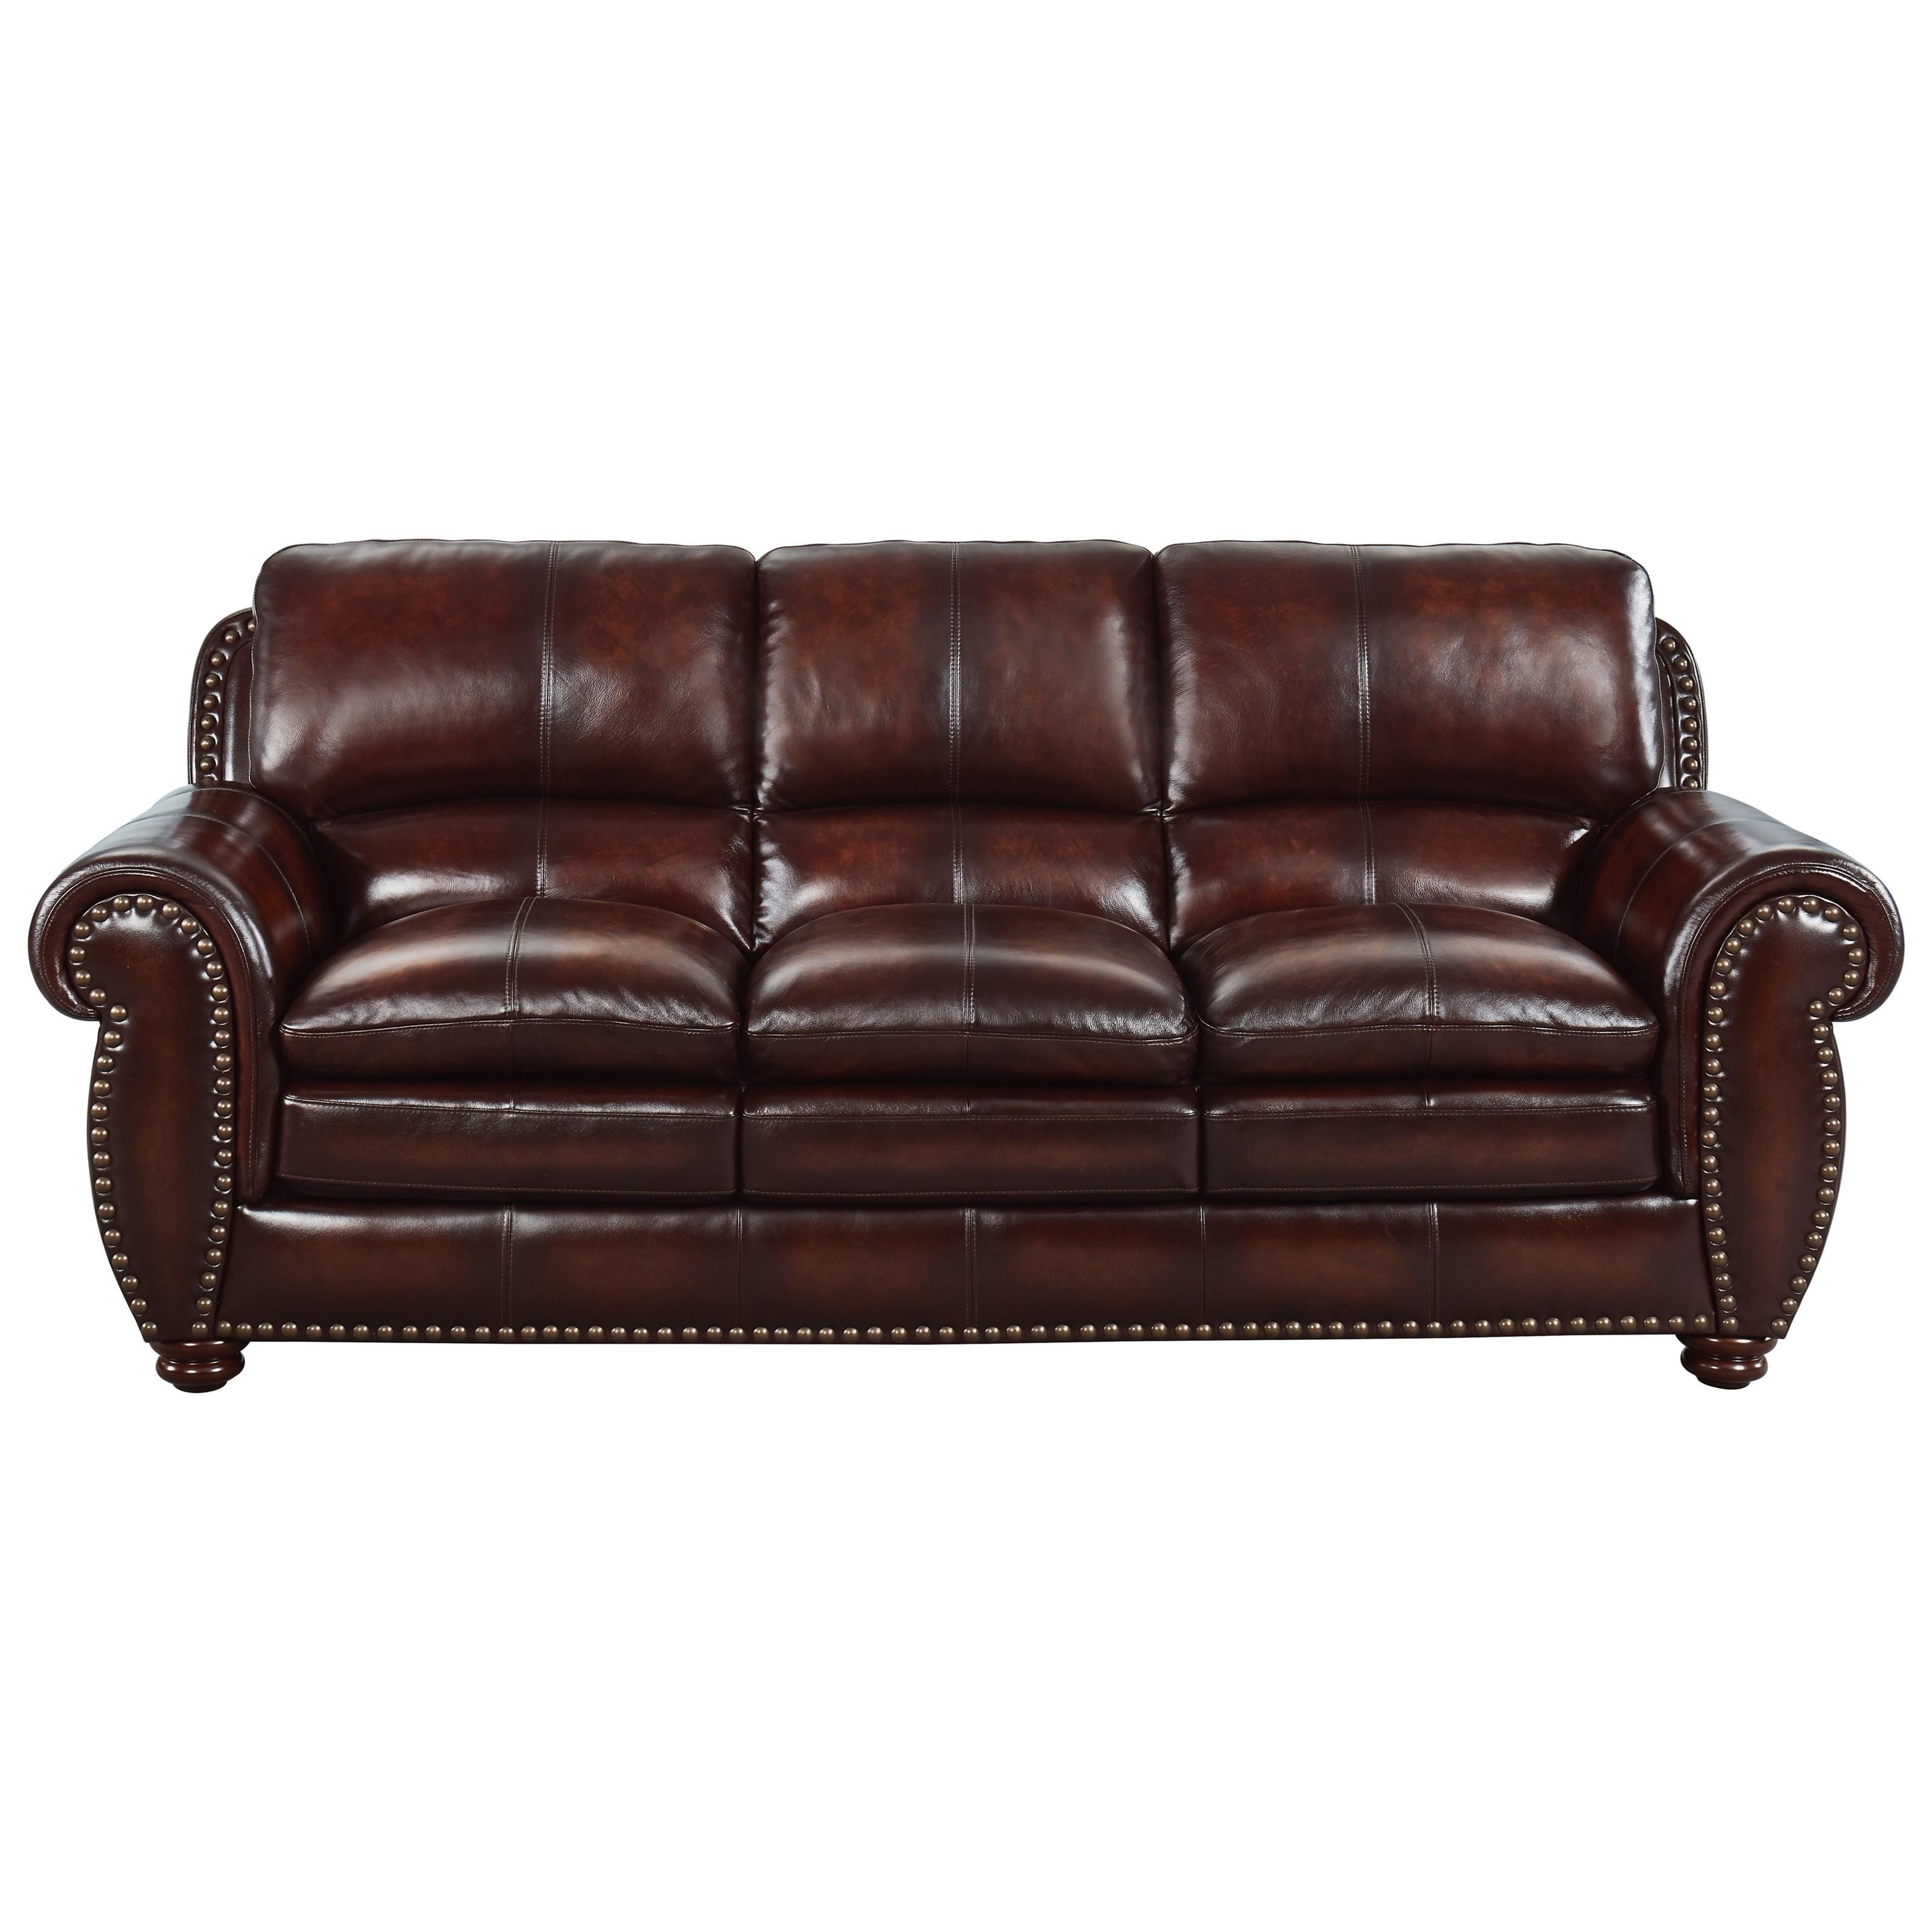 Leather Roll-Arm Sofa